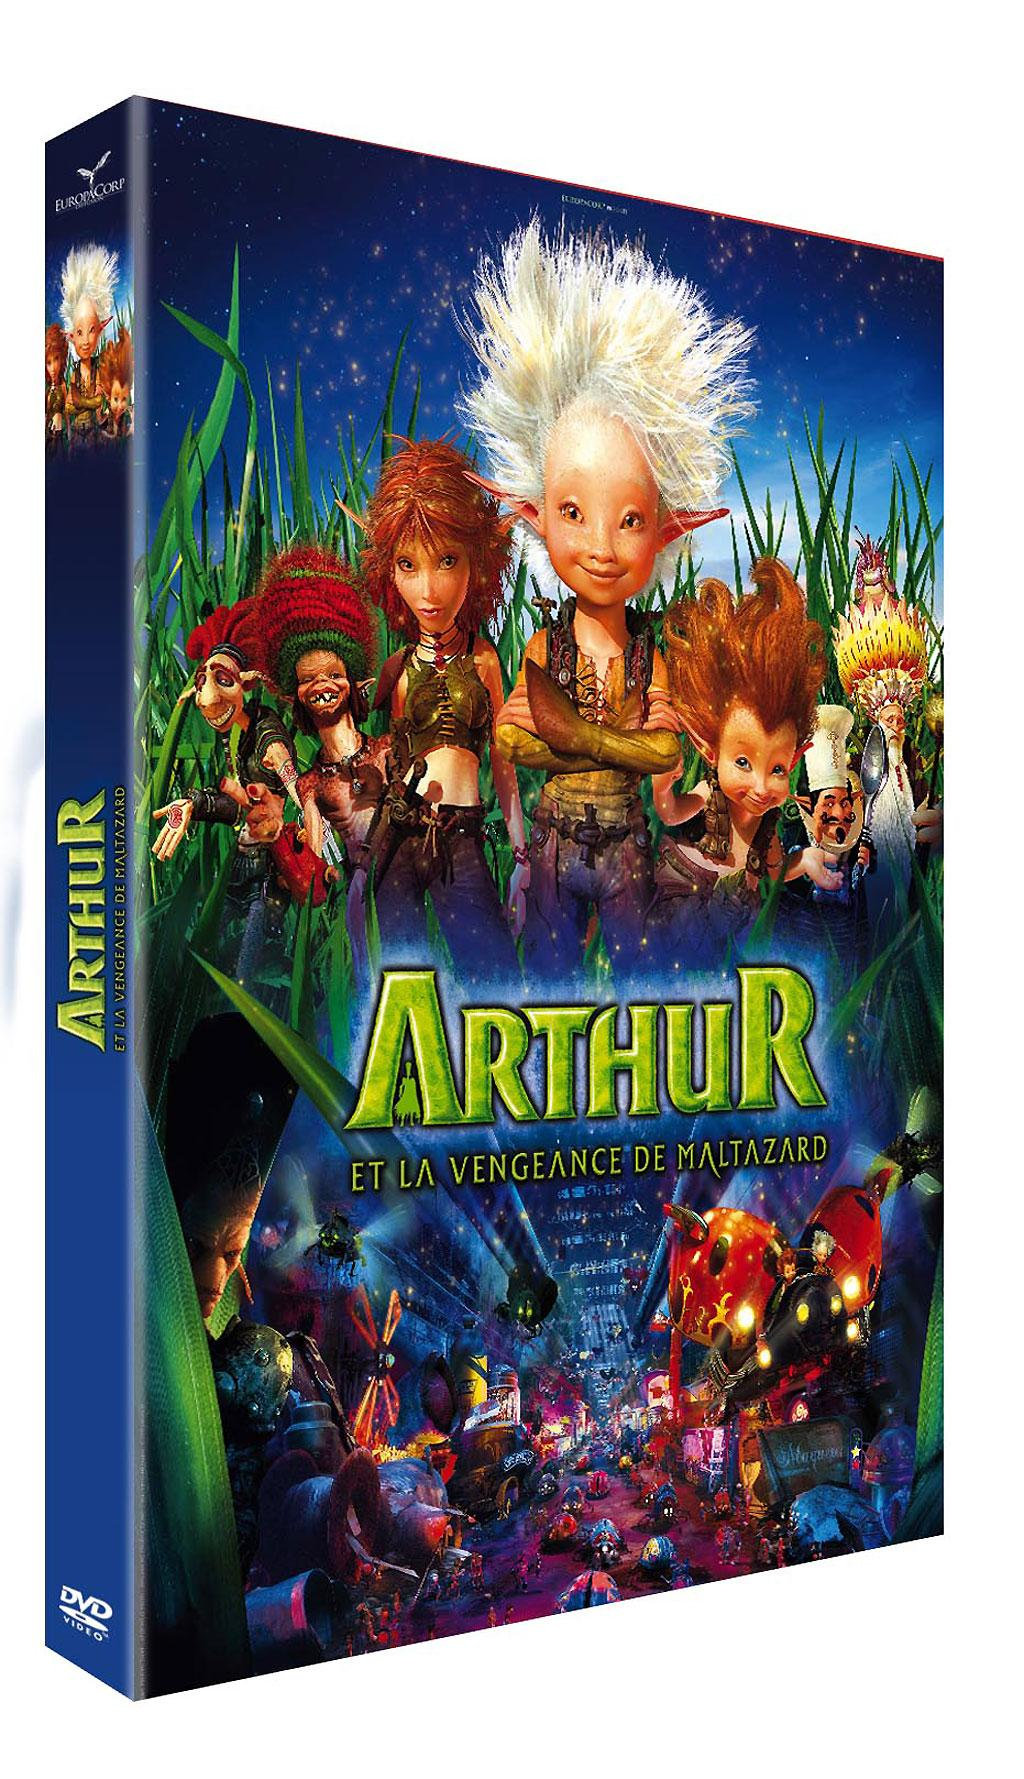 Arthur et la vengeance de Maltazard streaming vf | fCine.TV